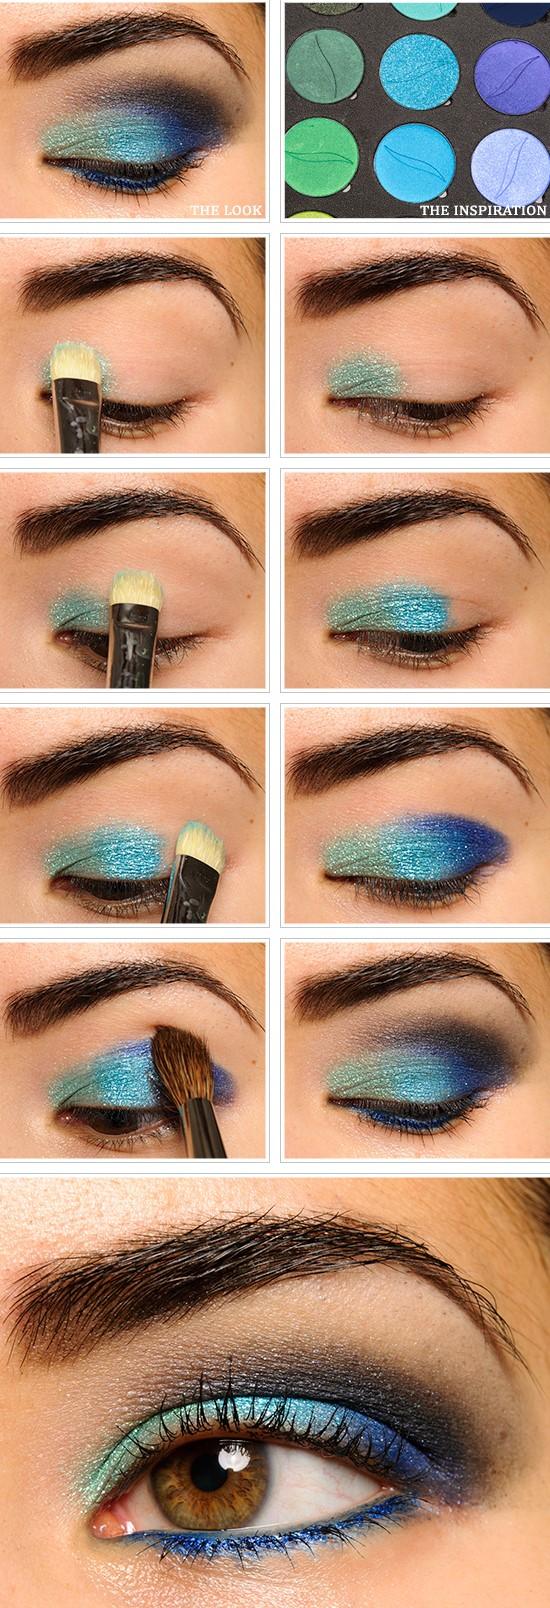 sephora_tutorial_blueglitters001